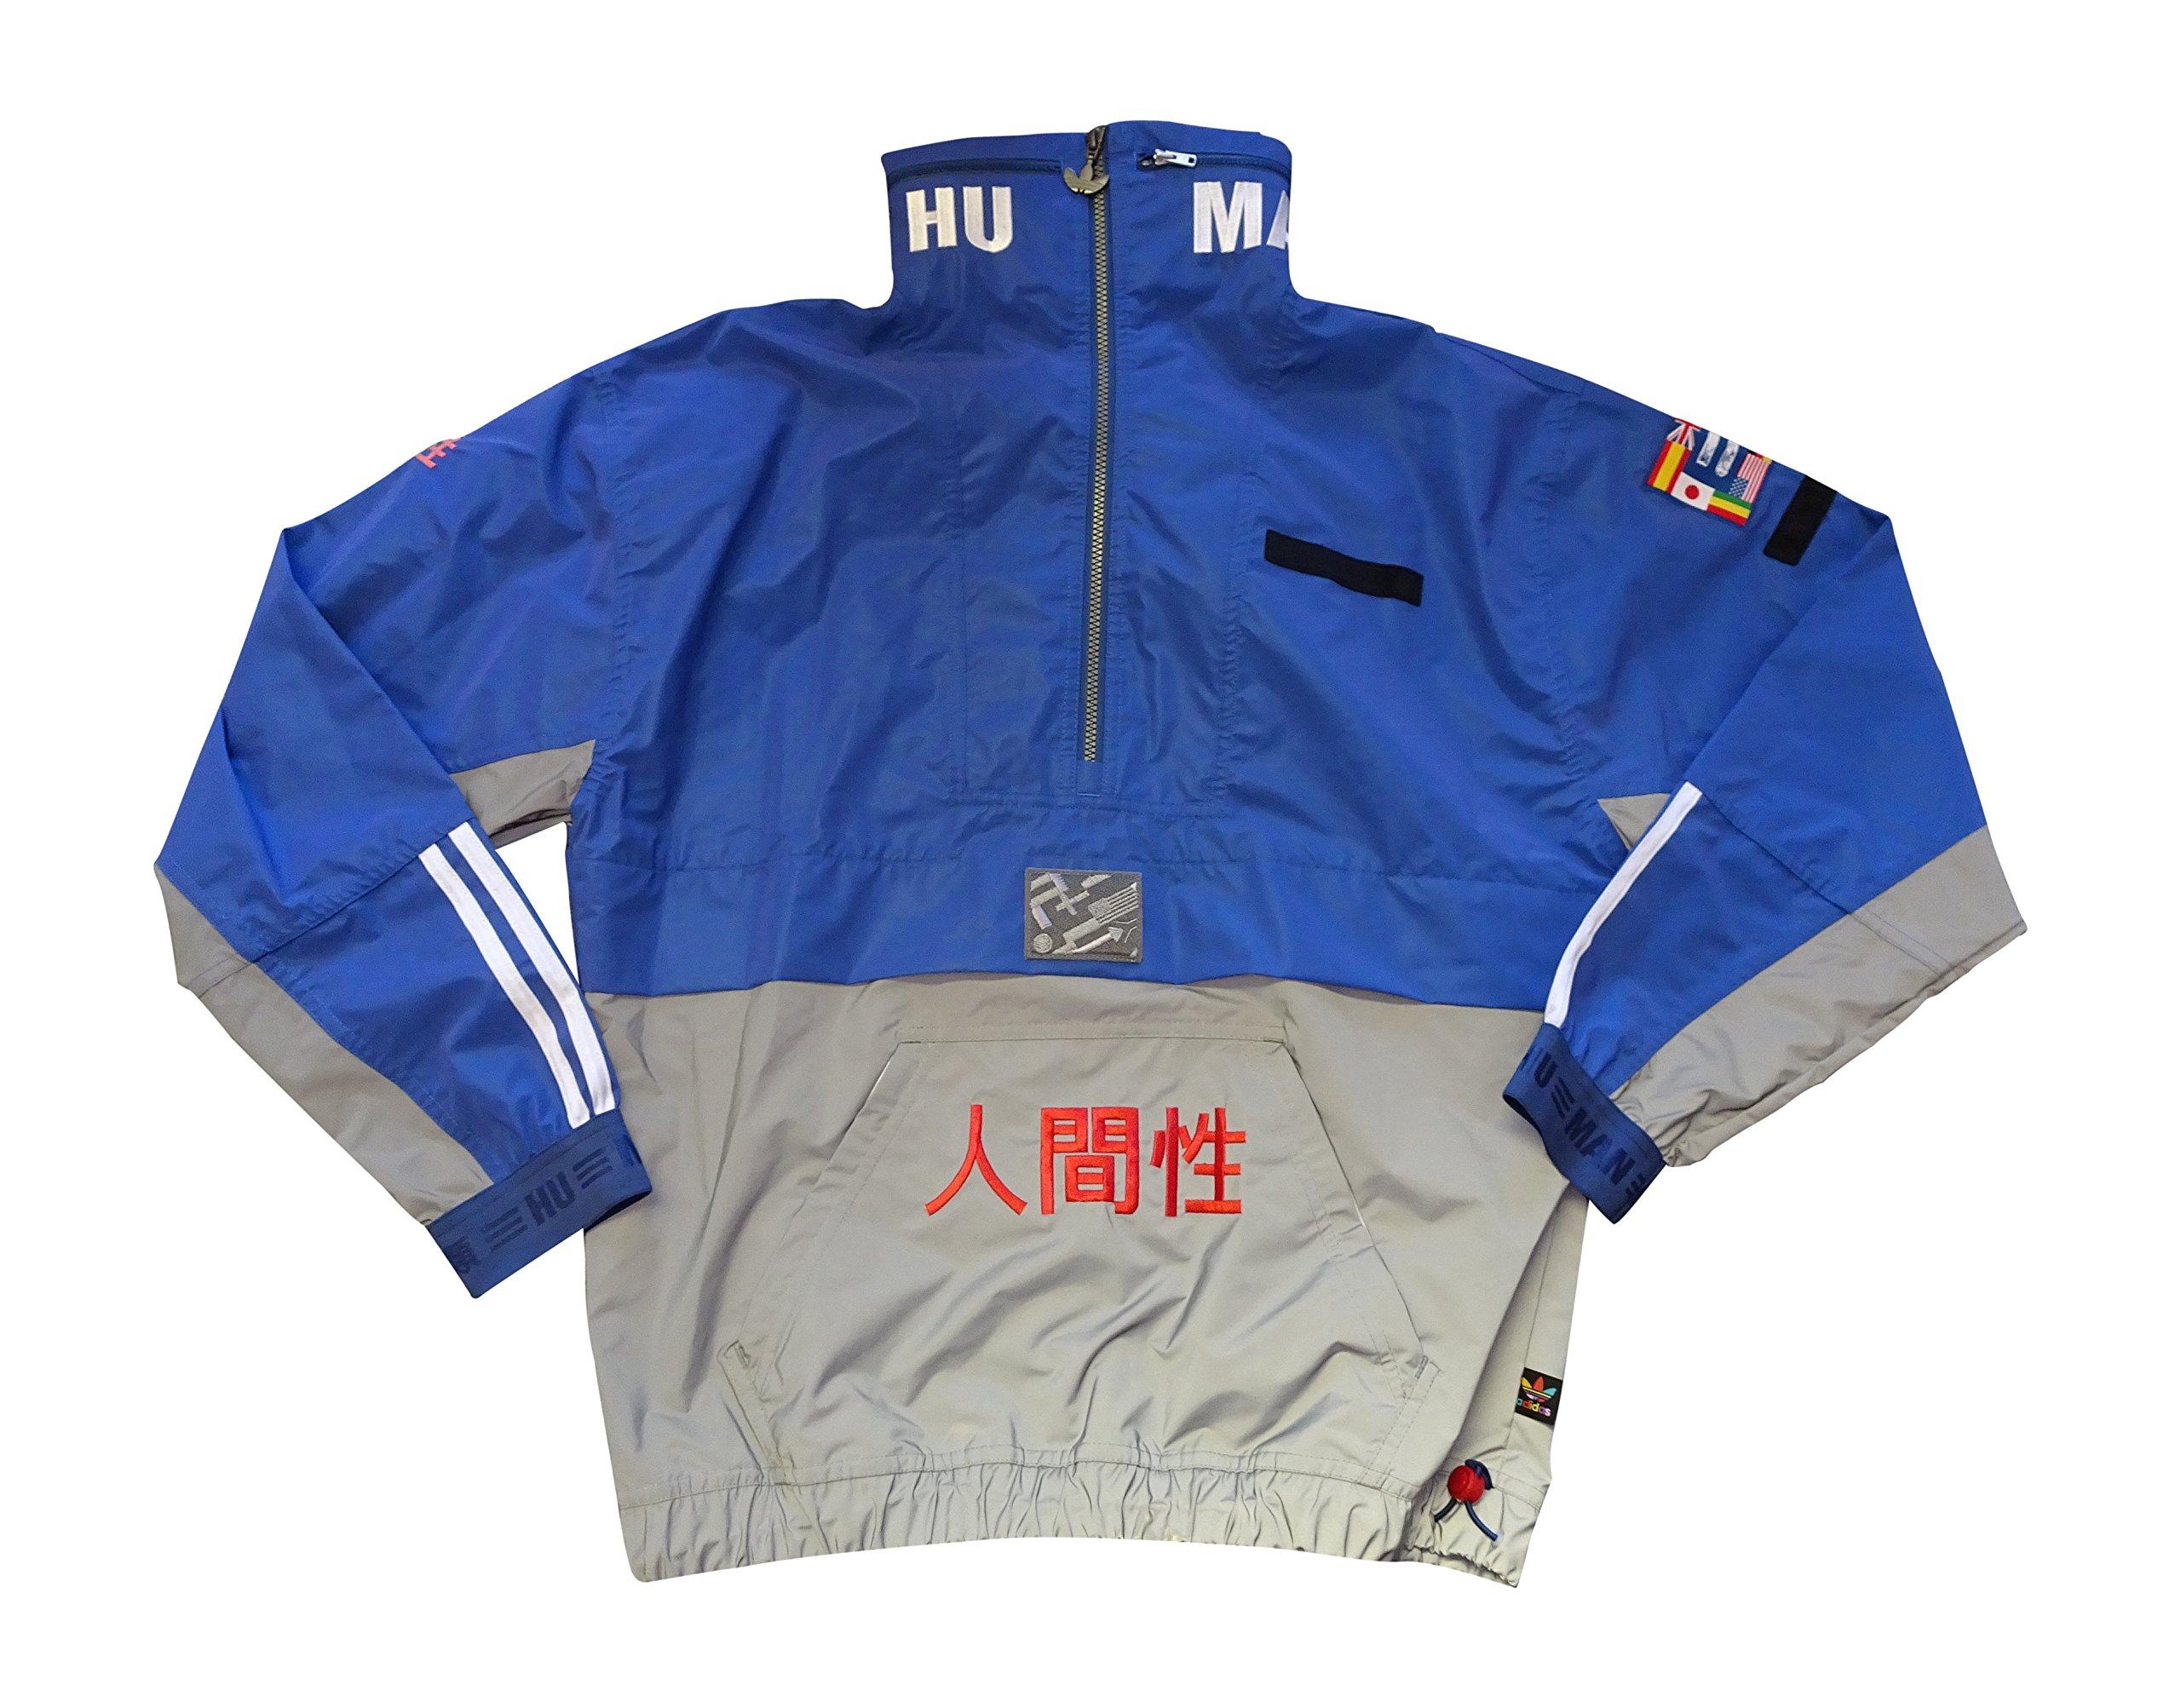 adidas X Pharrell Williams Human Race Half Zip Wind Breaker Jacket (Medium, Multicoloured BR3148) by adidas